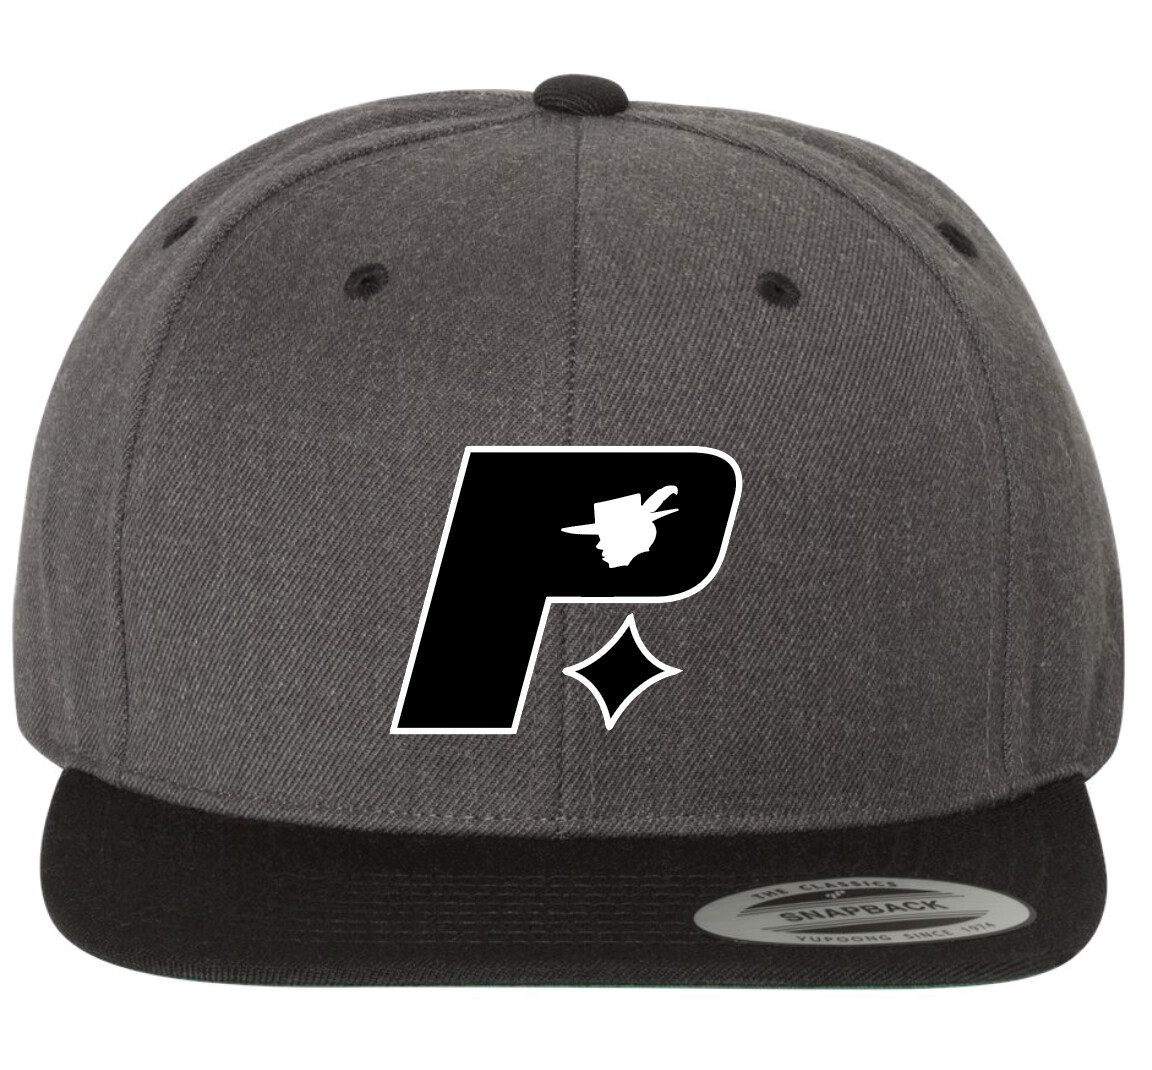 Pimprov Baseball Hat. Grey & Black